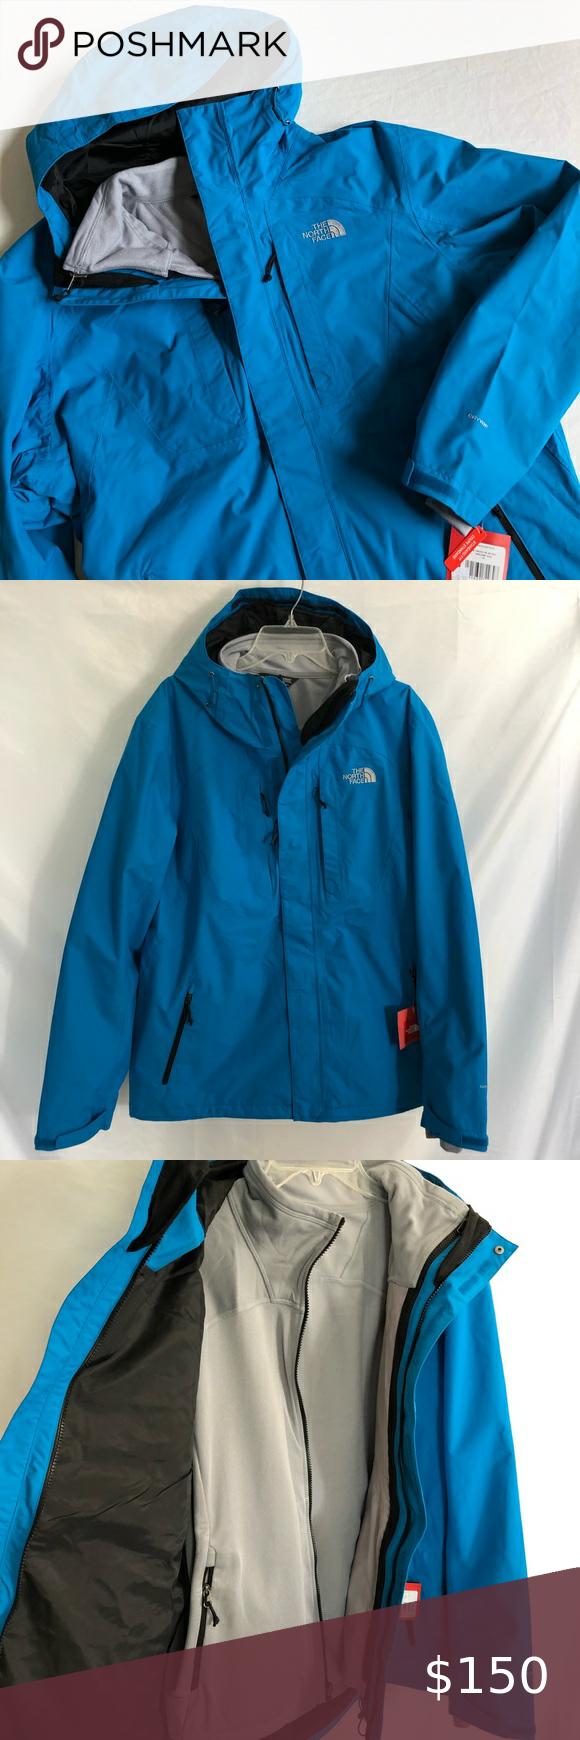 North Face Cinder Tri Climate 3 In 1 Ski Jacket Xl Ski Jacket Clothes Design Jackets [ 1740 x 580 Pixel ]